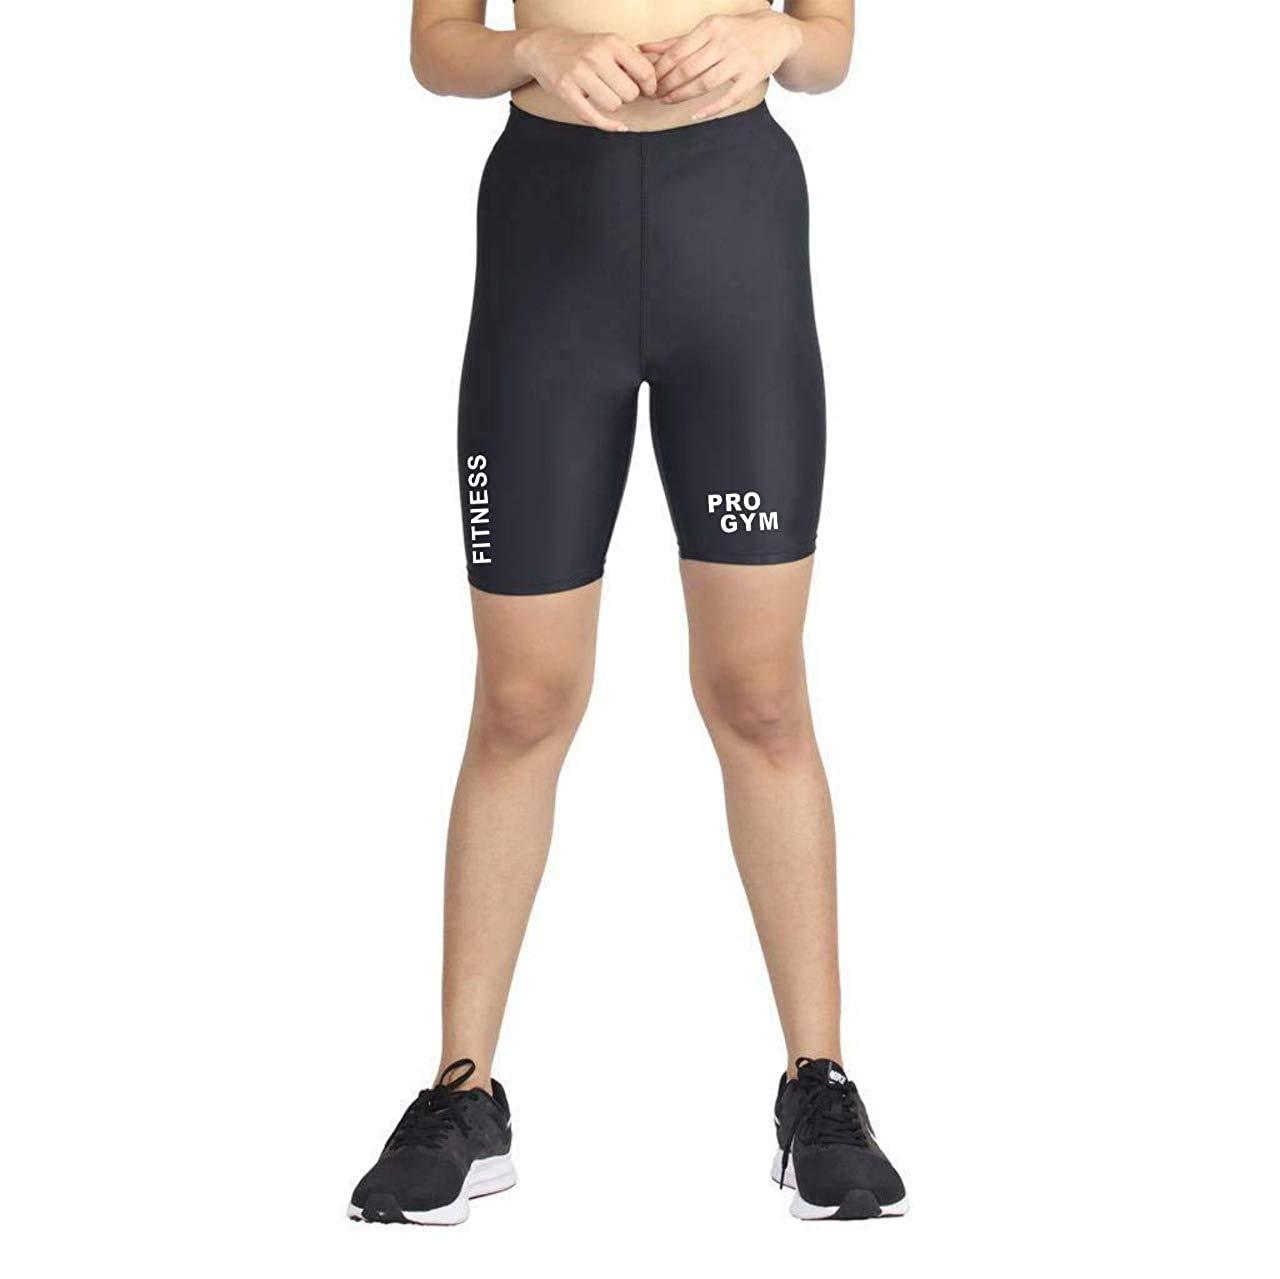 Pro Gym Men's Running Shorts